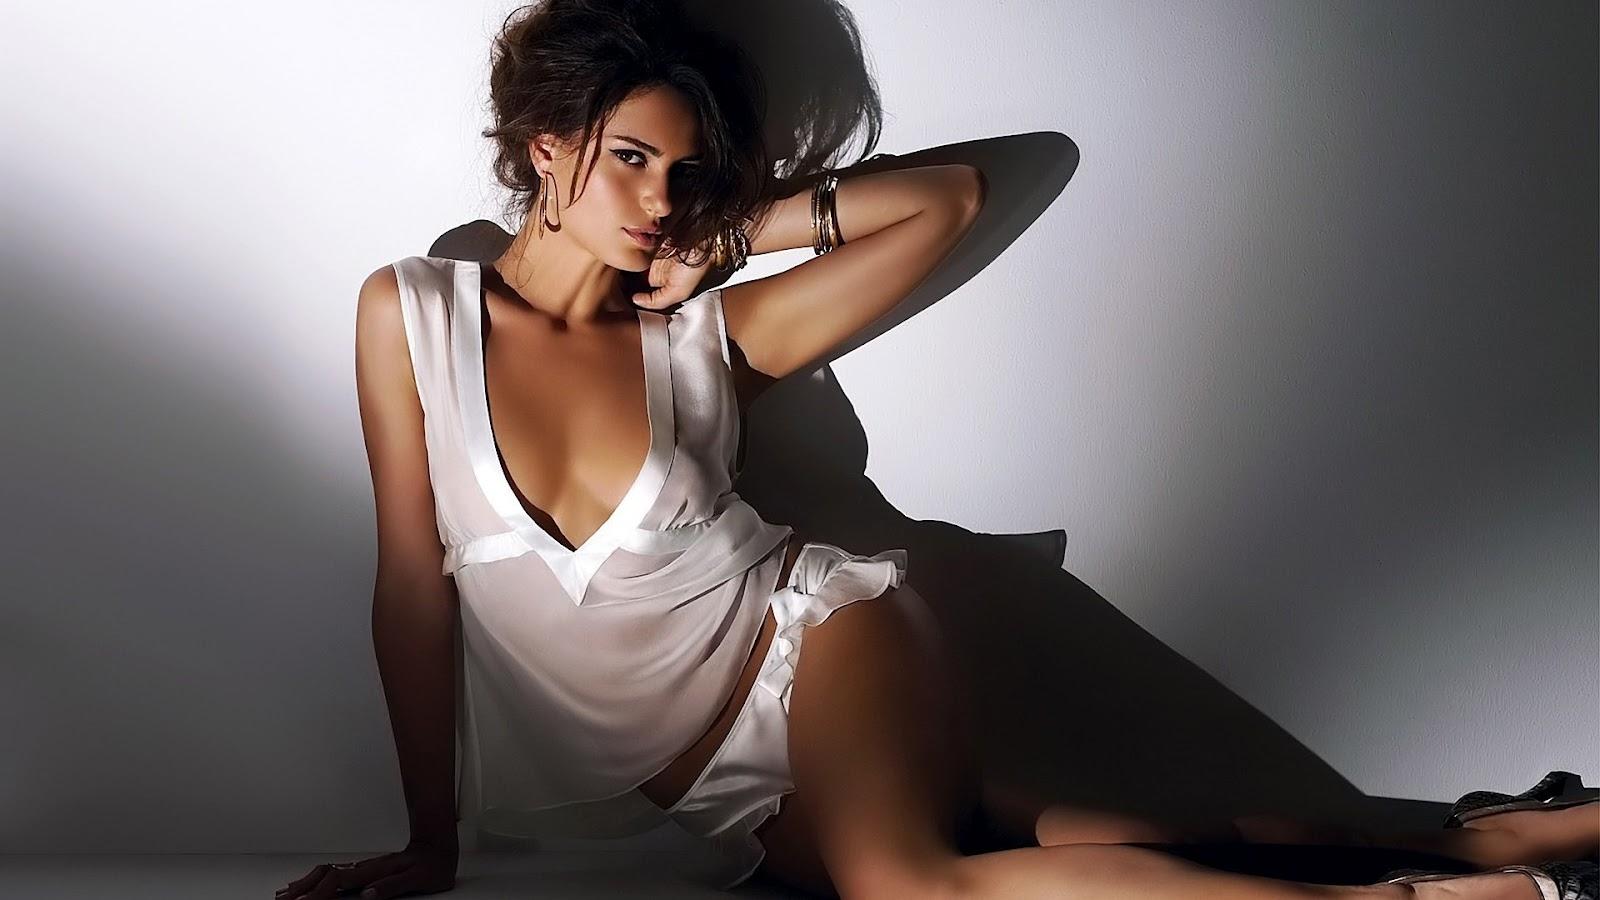 Amy Acker New HD Wallpapers 2012-2013 ~ HOT CELEBRITY ... Alessandra Ambrosio Bellazon